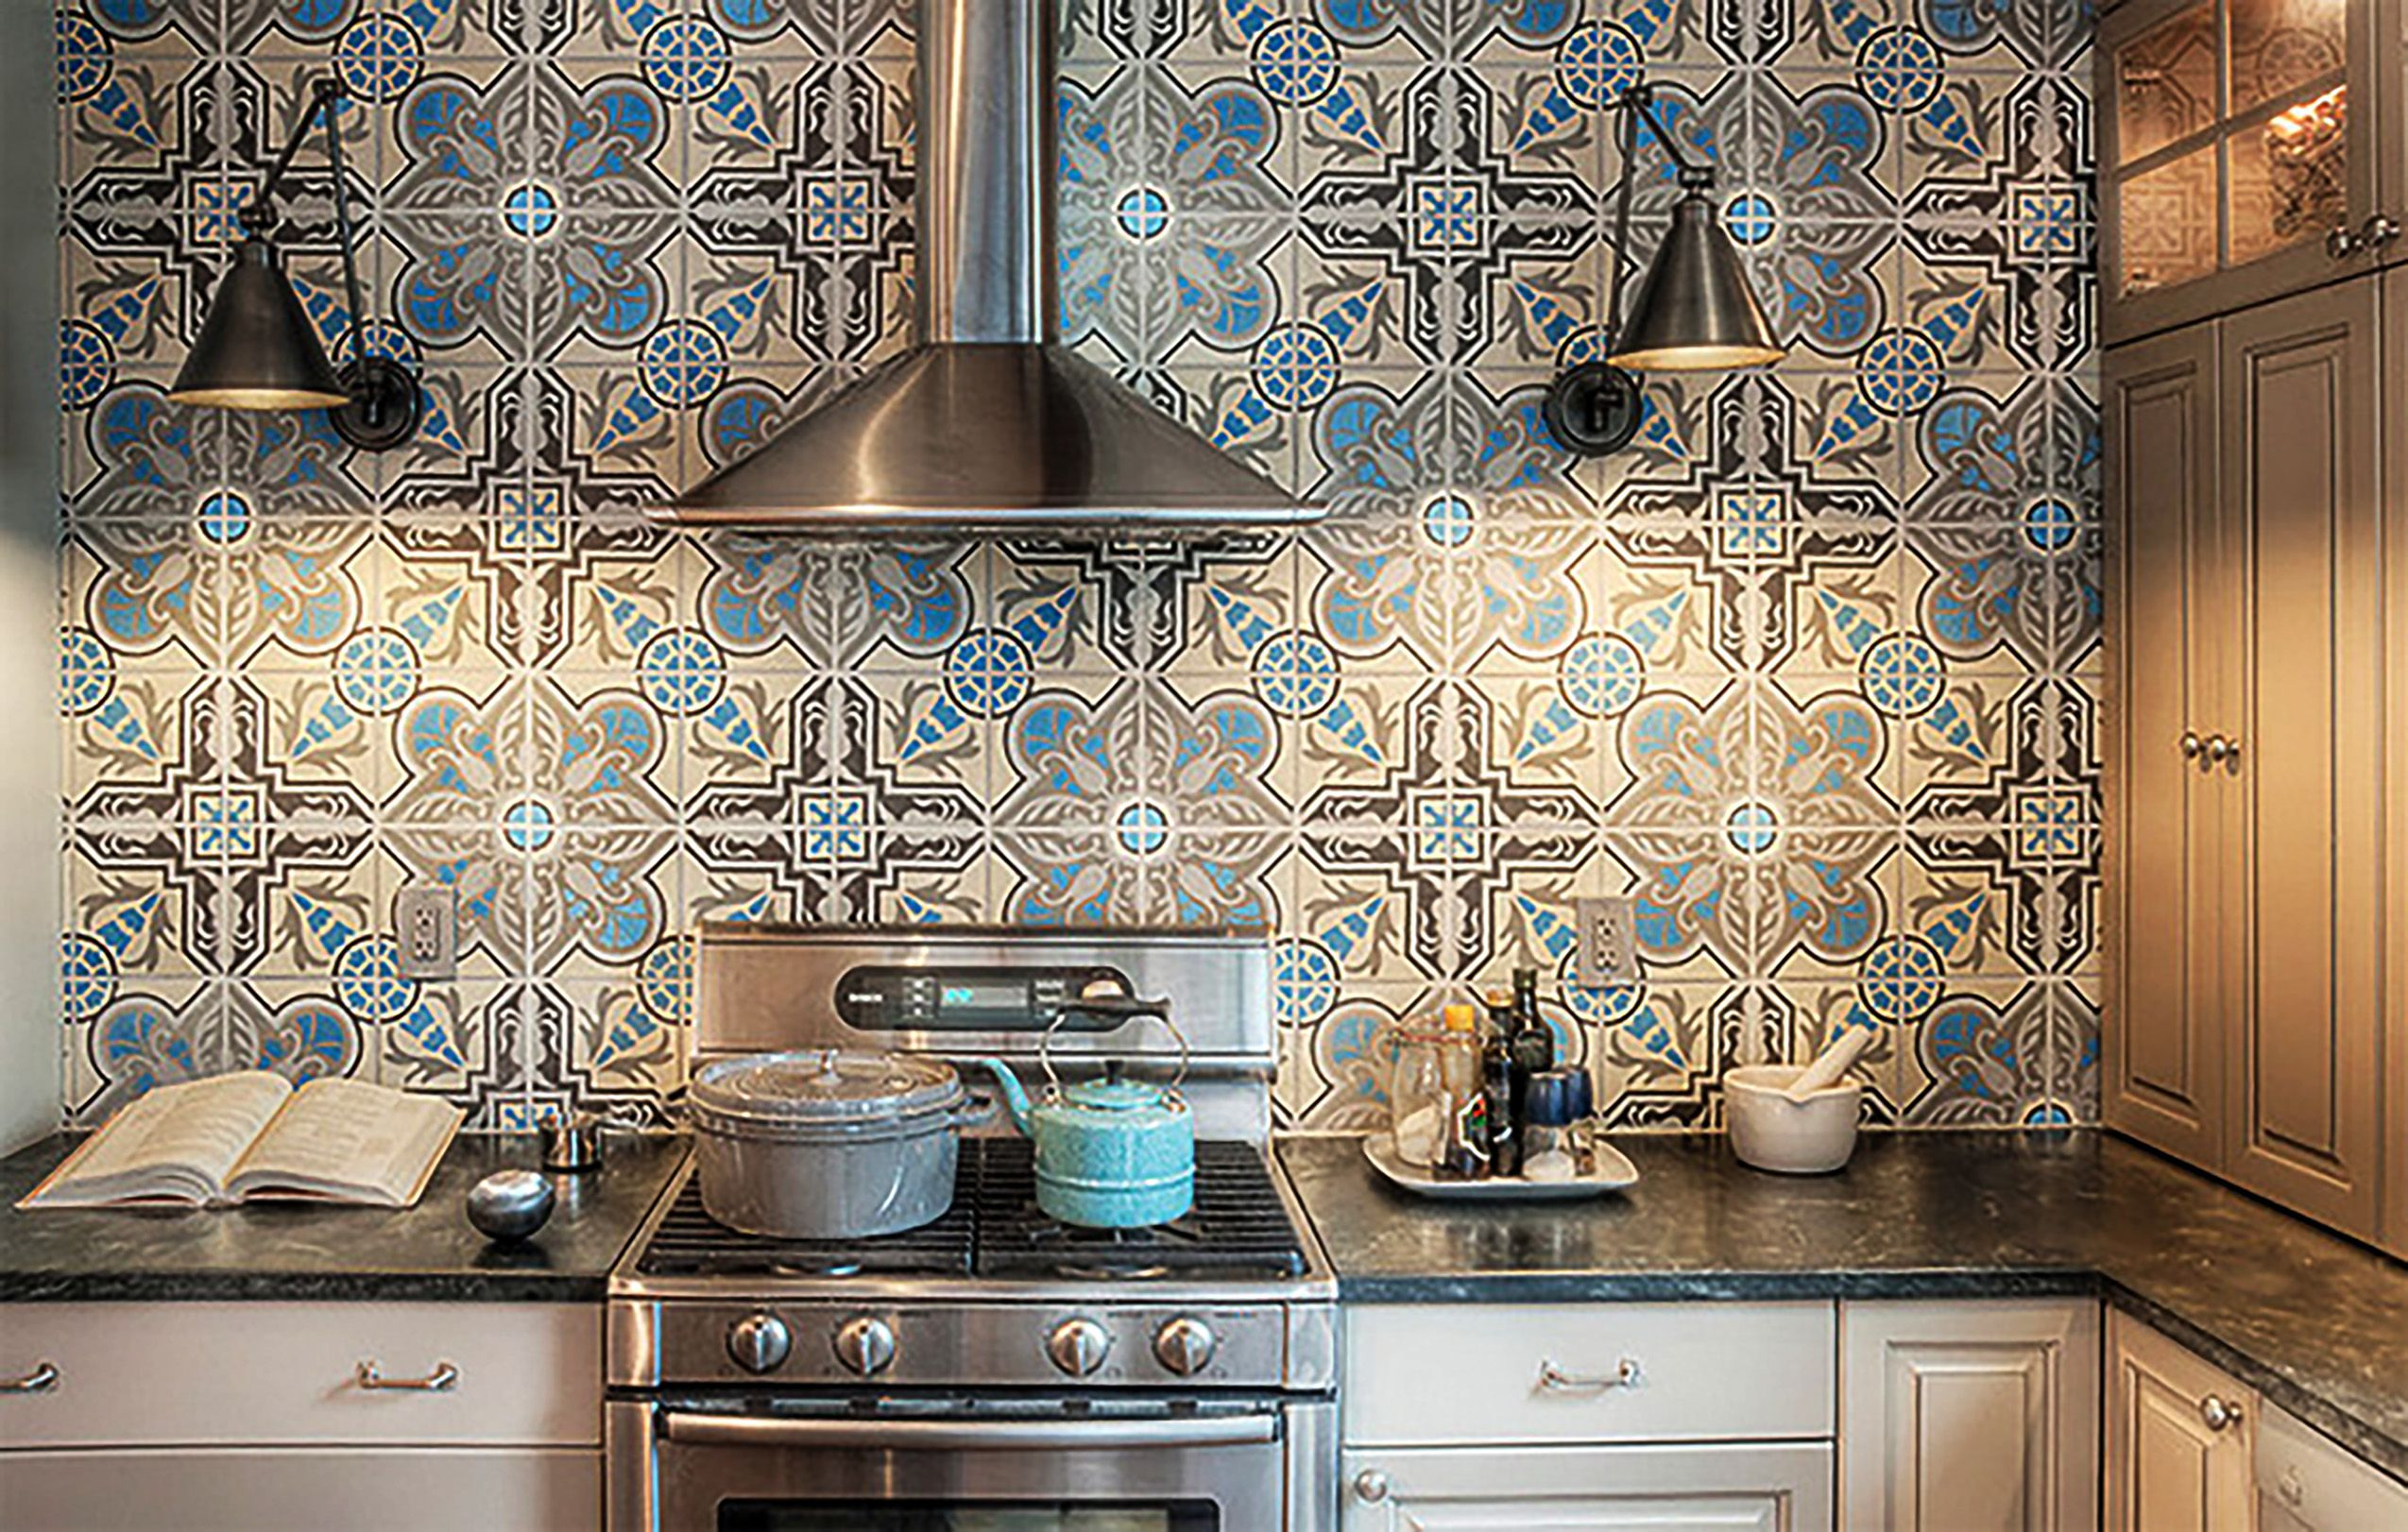 cozinha decorada - Google Search | Interior Designs | Pinterest